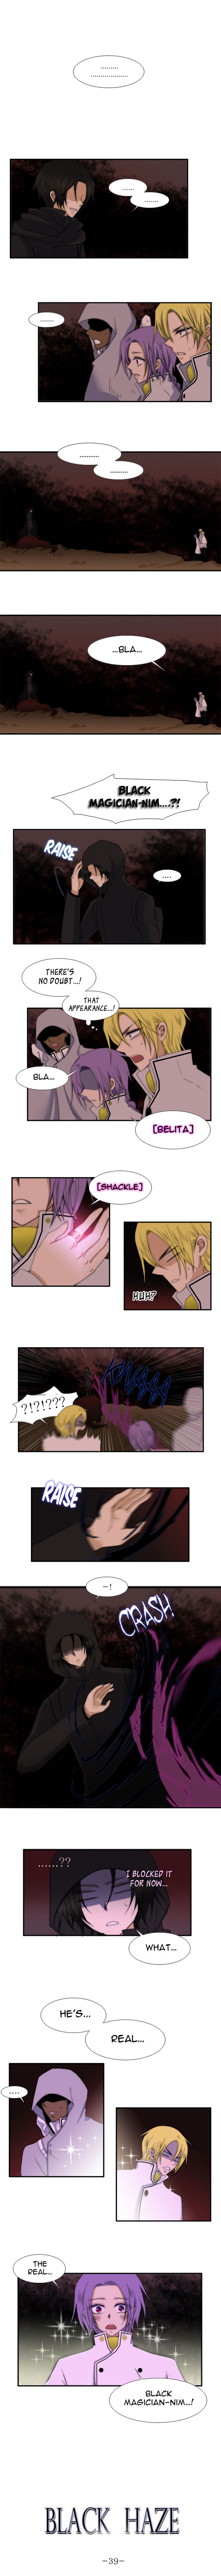 Black Haze 39 Page 2